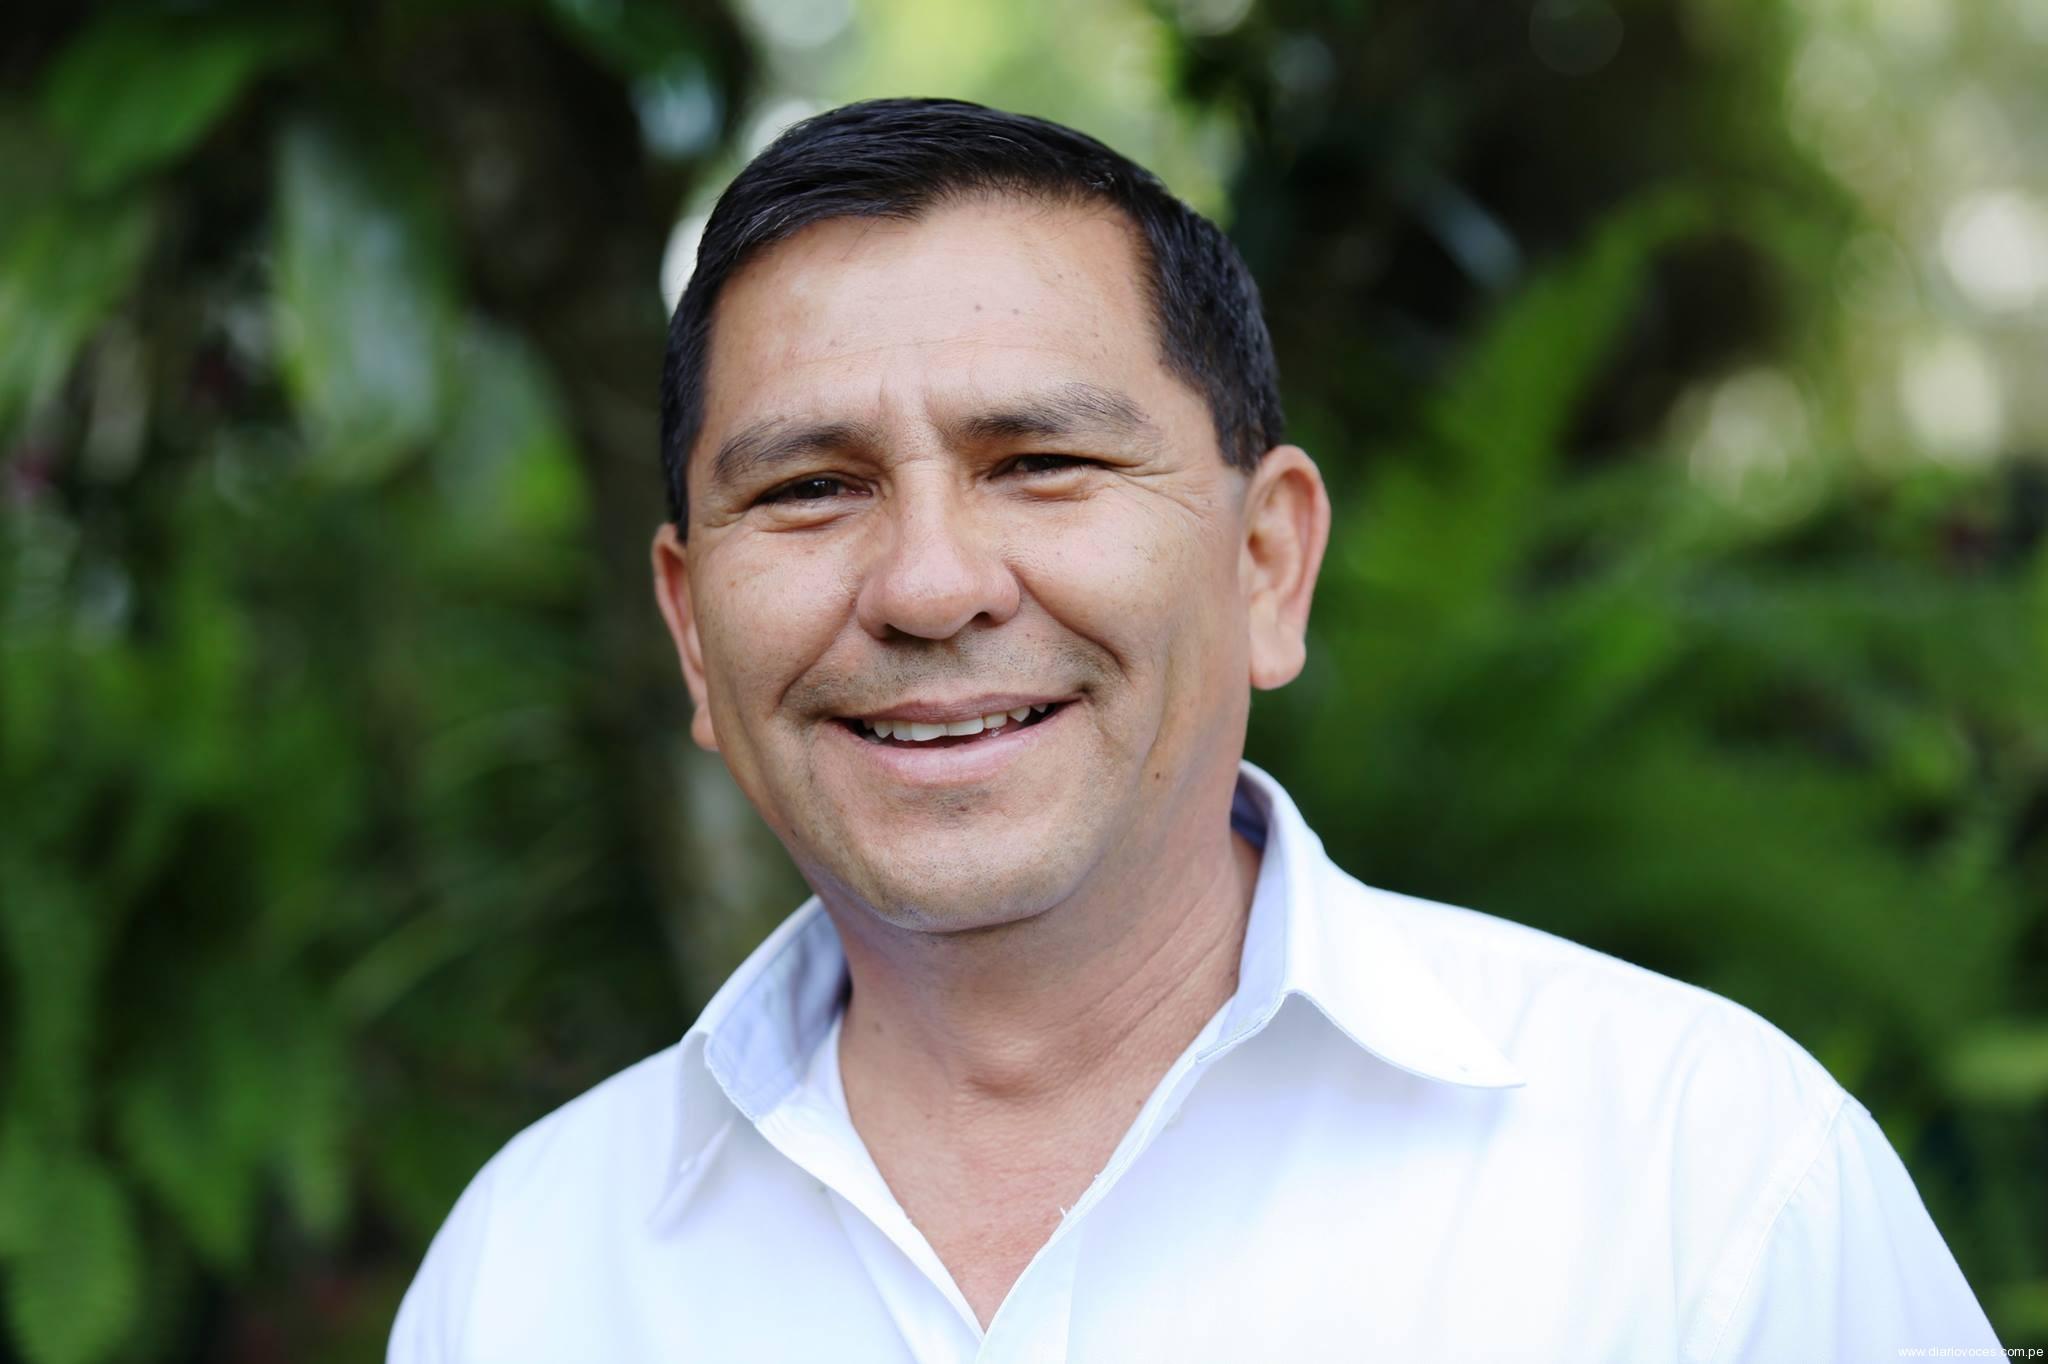 Manuel Aguilar Net Worth